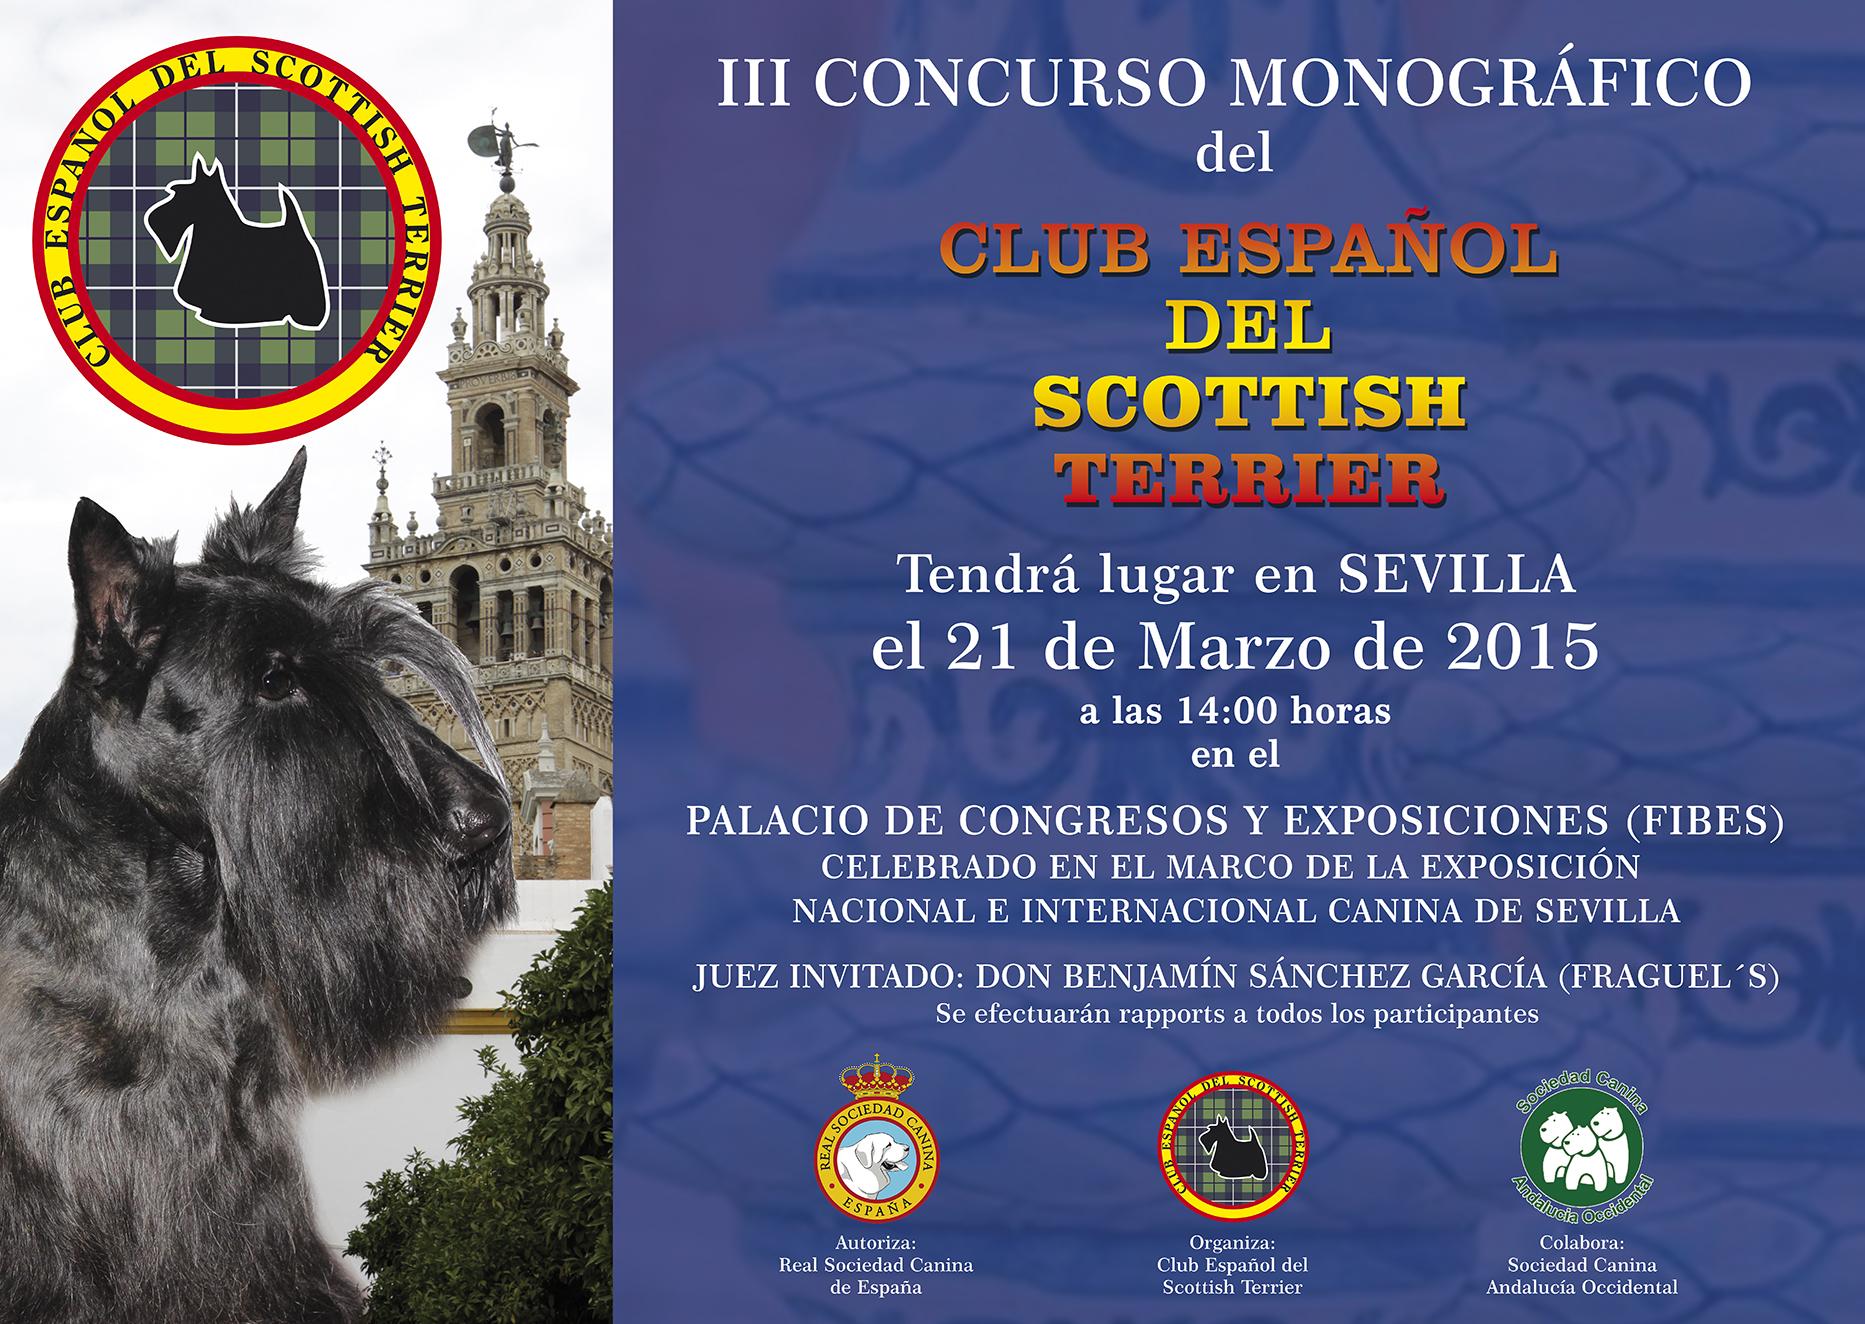 III Concurso Monografico Sevilla cara A